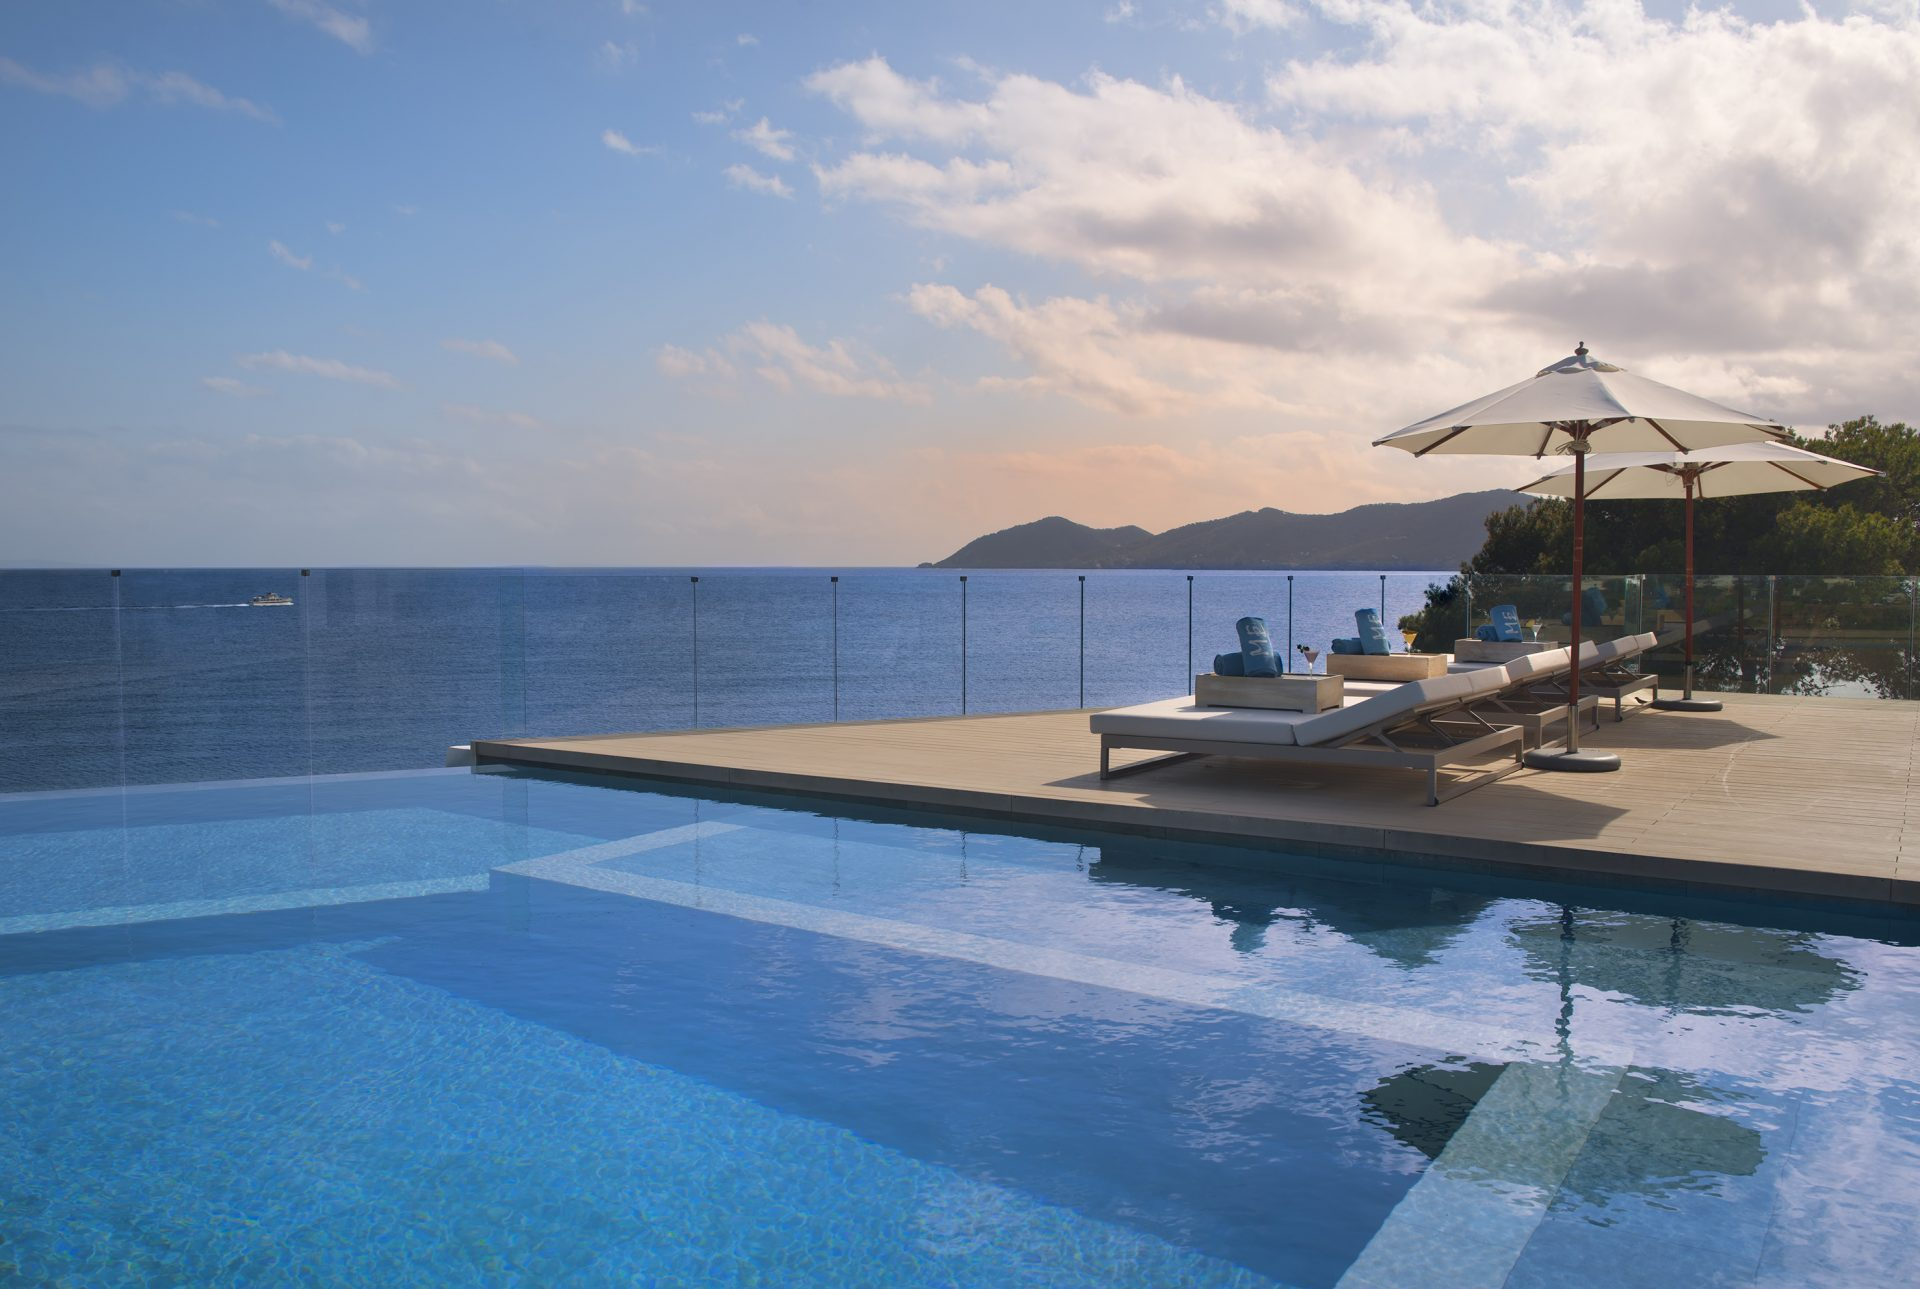 316ME Ibiza Terrace Vip Pool The Rooftop